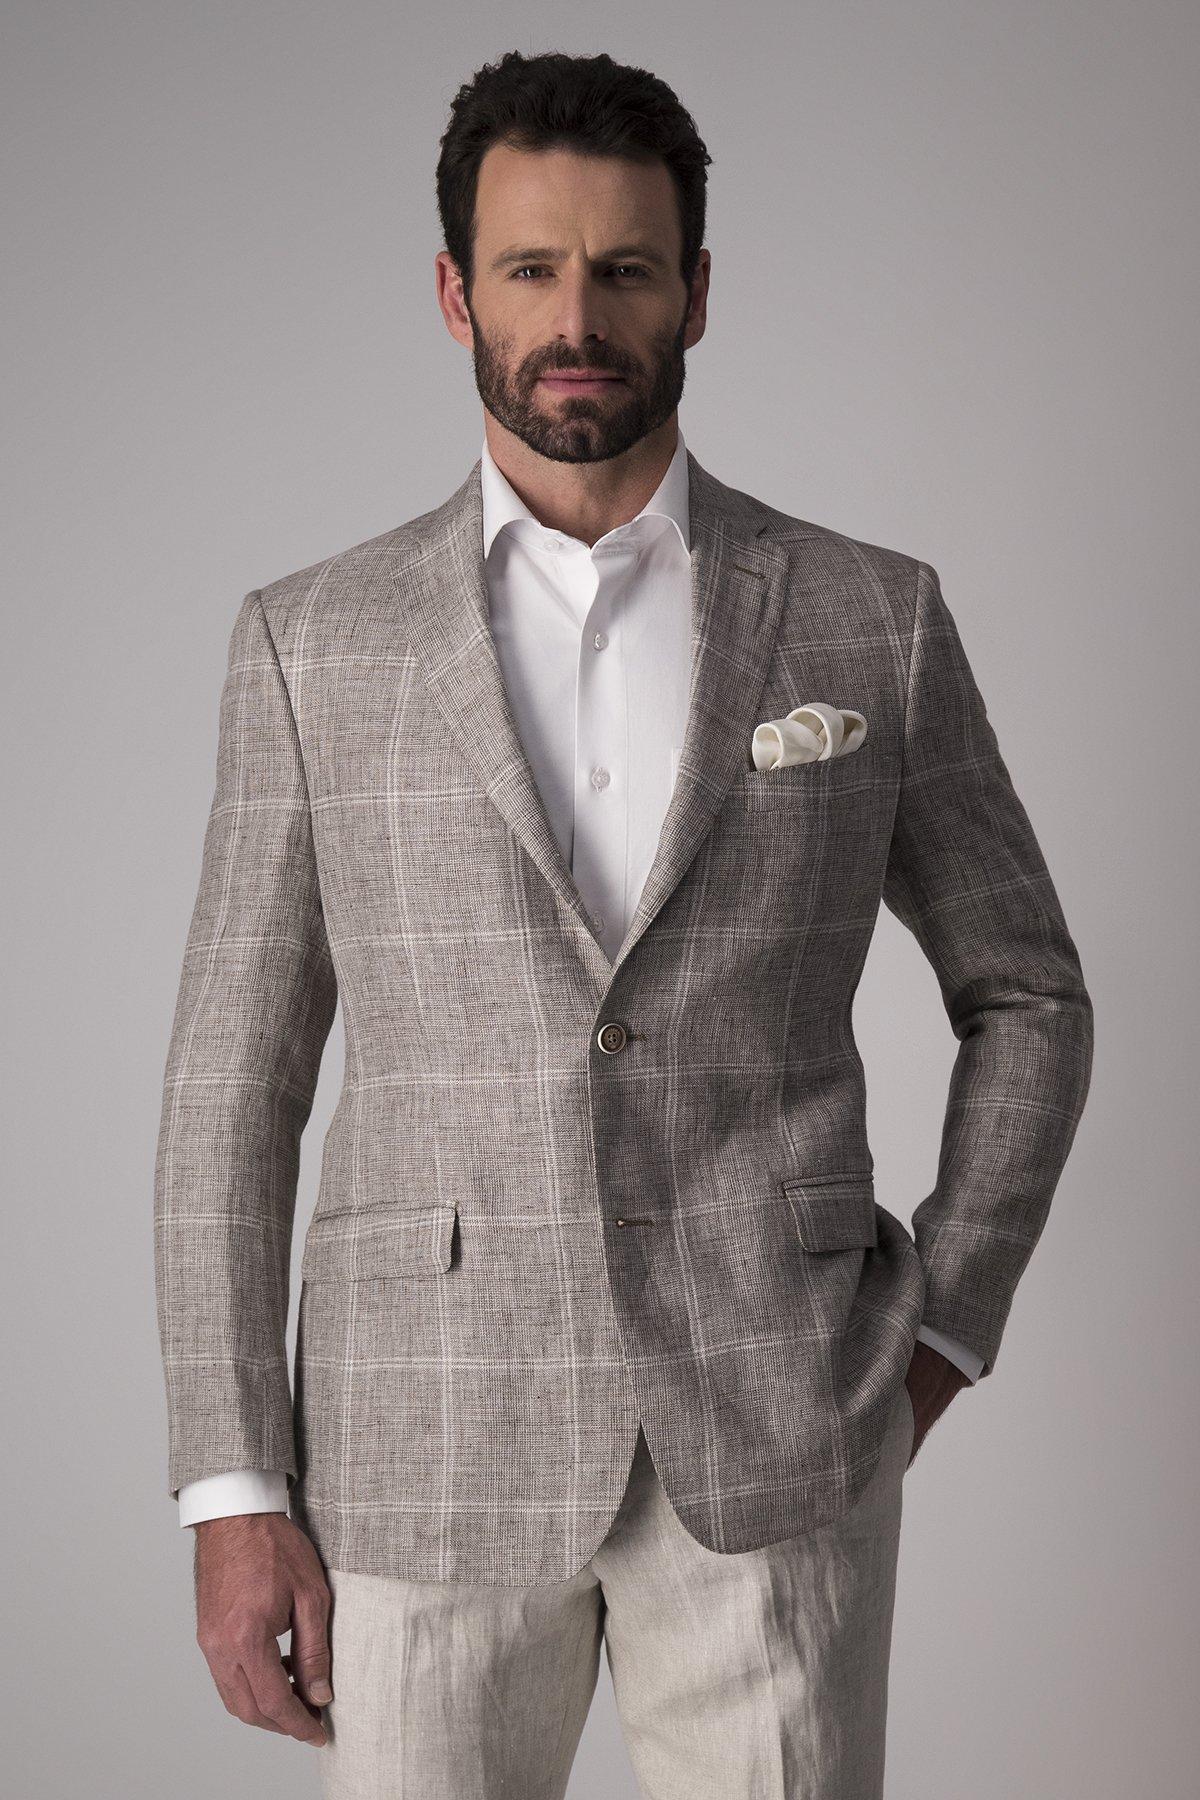 Saco Calderoni tela italiana cuadro beige,  Regular fit.